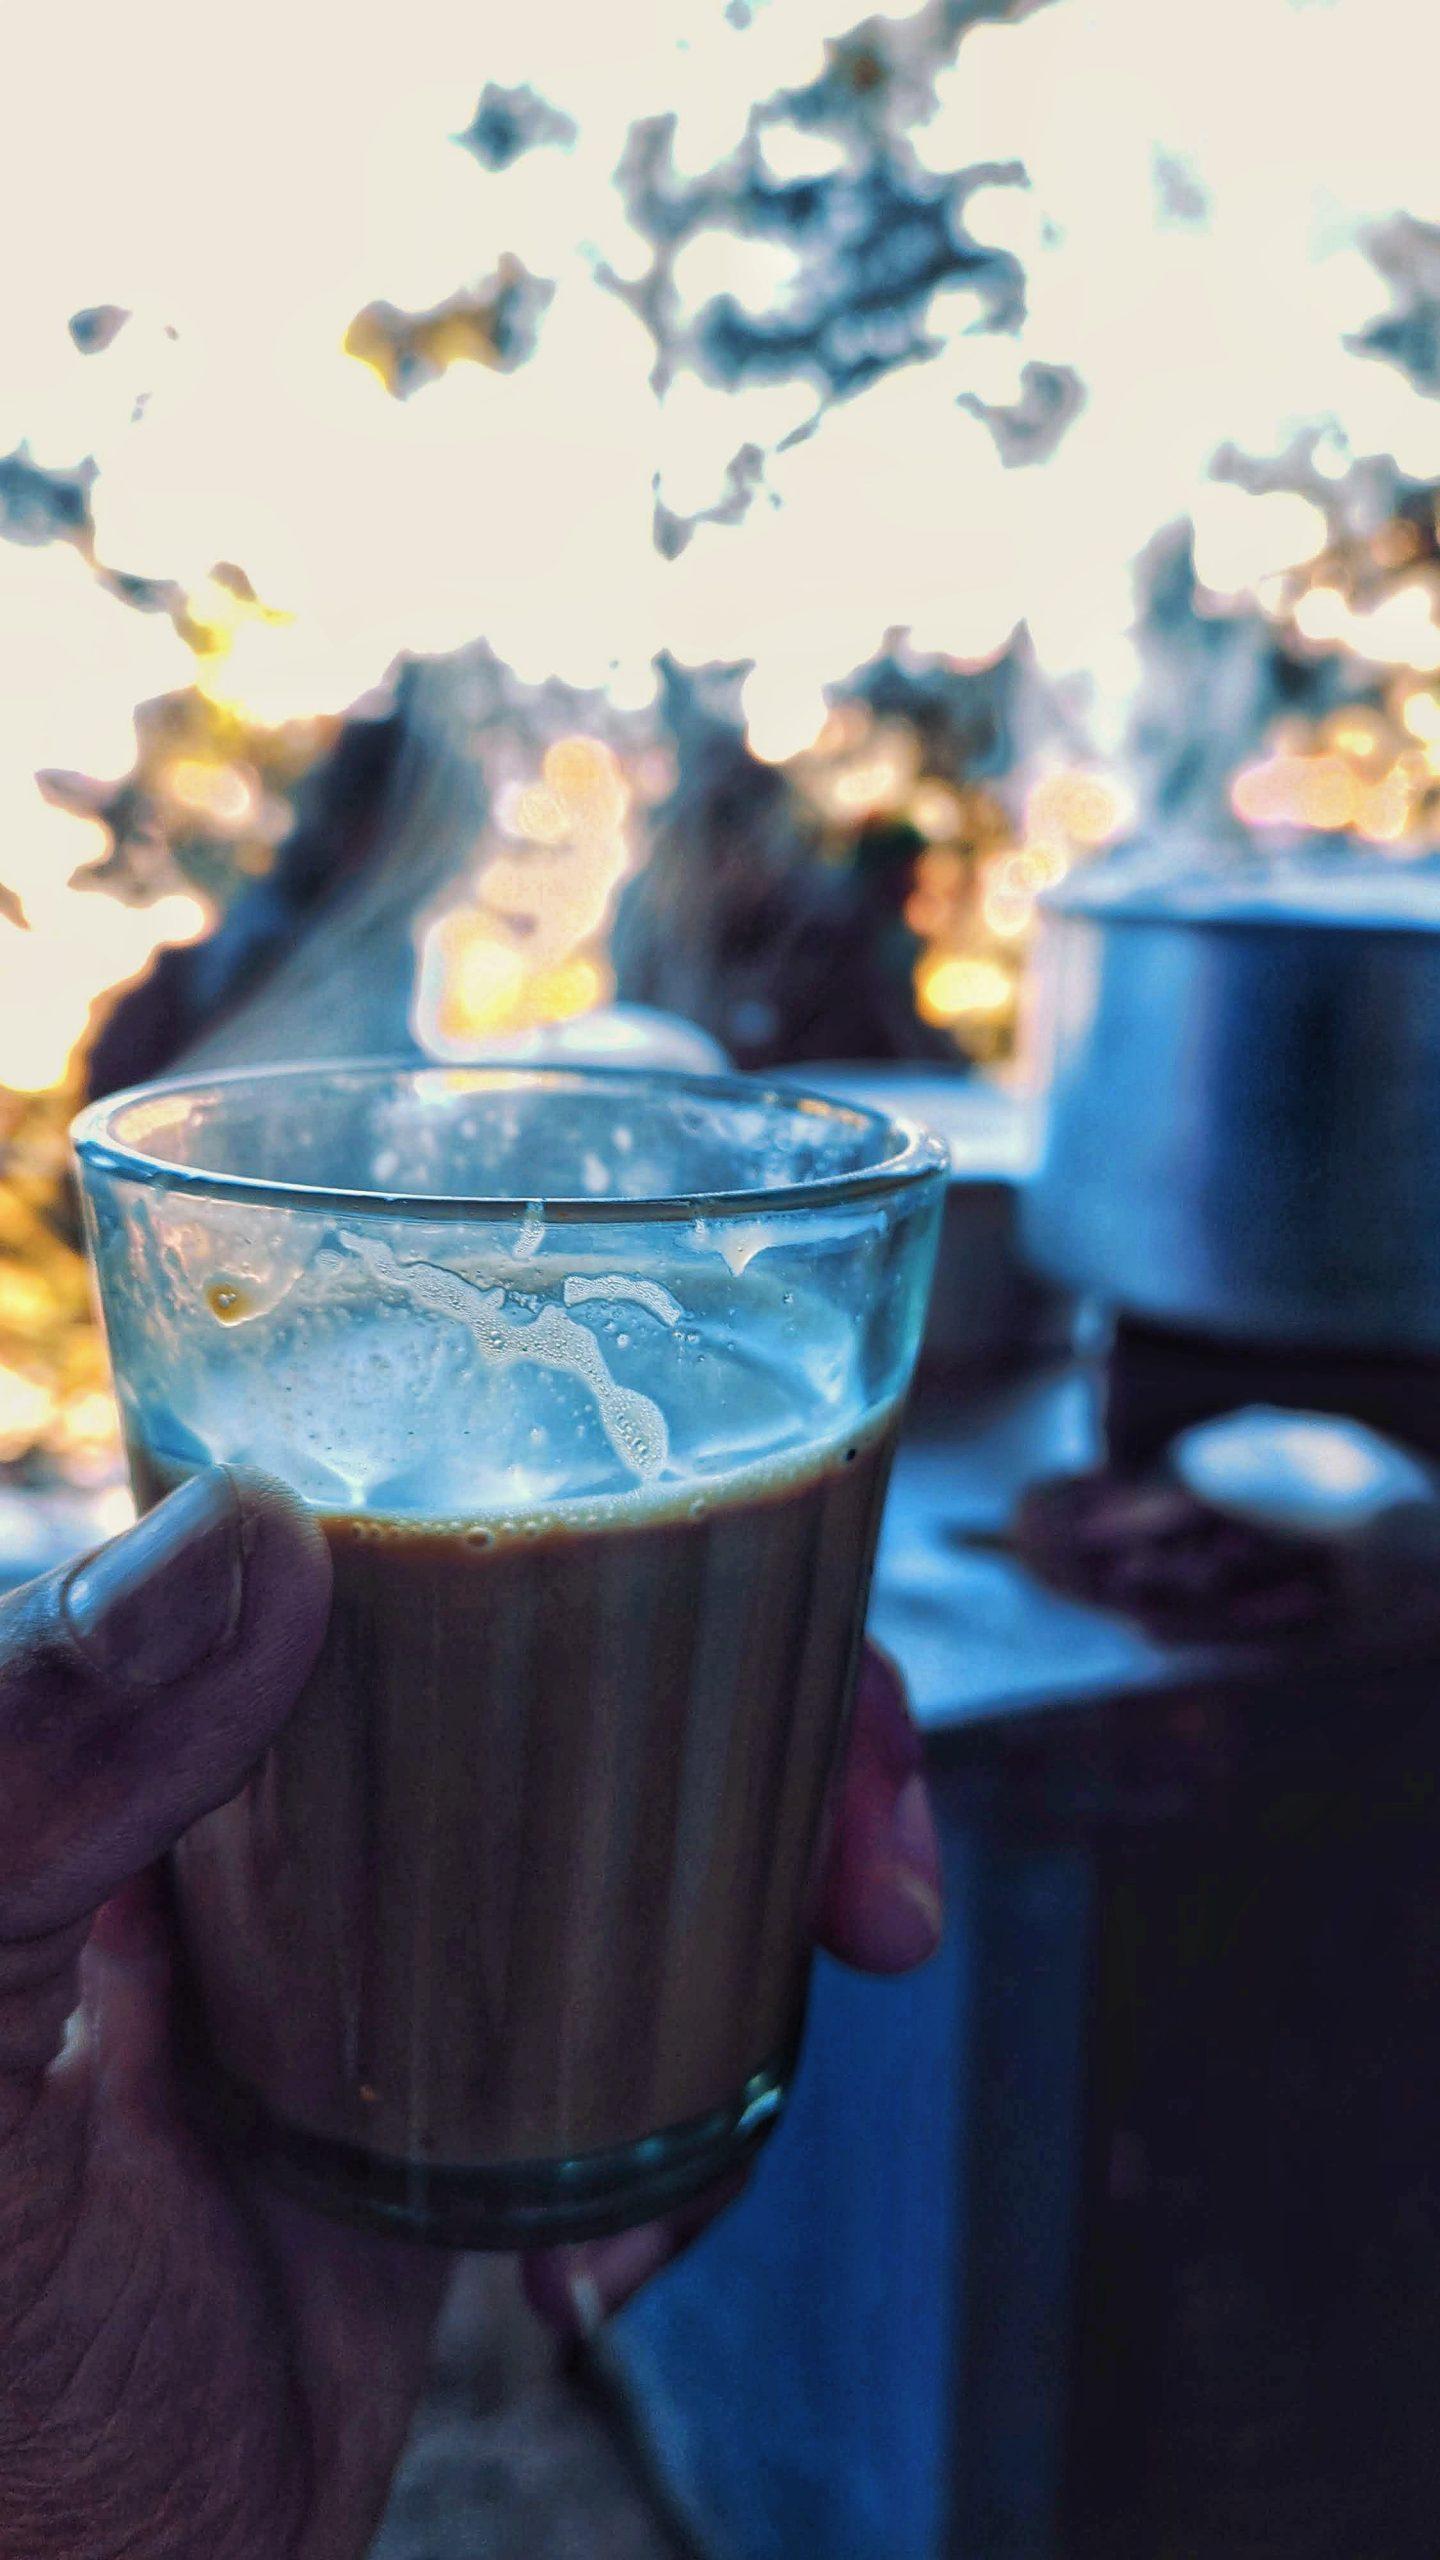 Street cup of tea